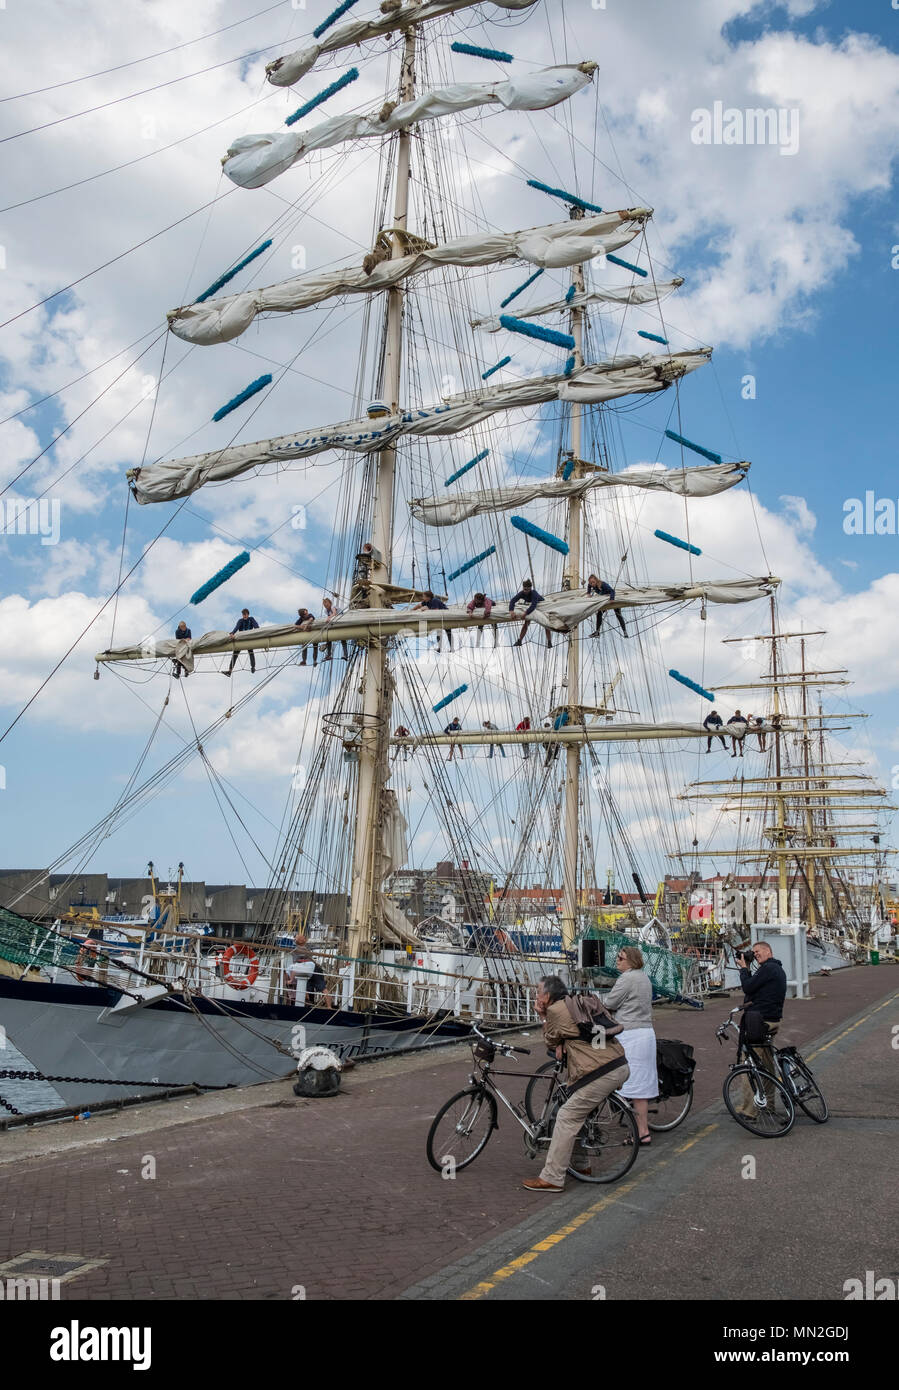 Tall sailing ships Fryderyk Chopin and Sorlandet berthed at Scheveningen harbour, The Hague, Netherlands. - Stock Image